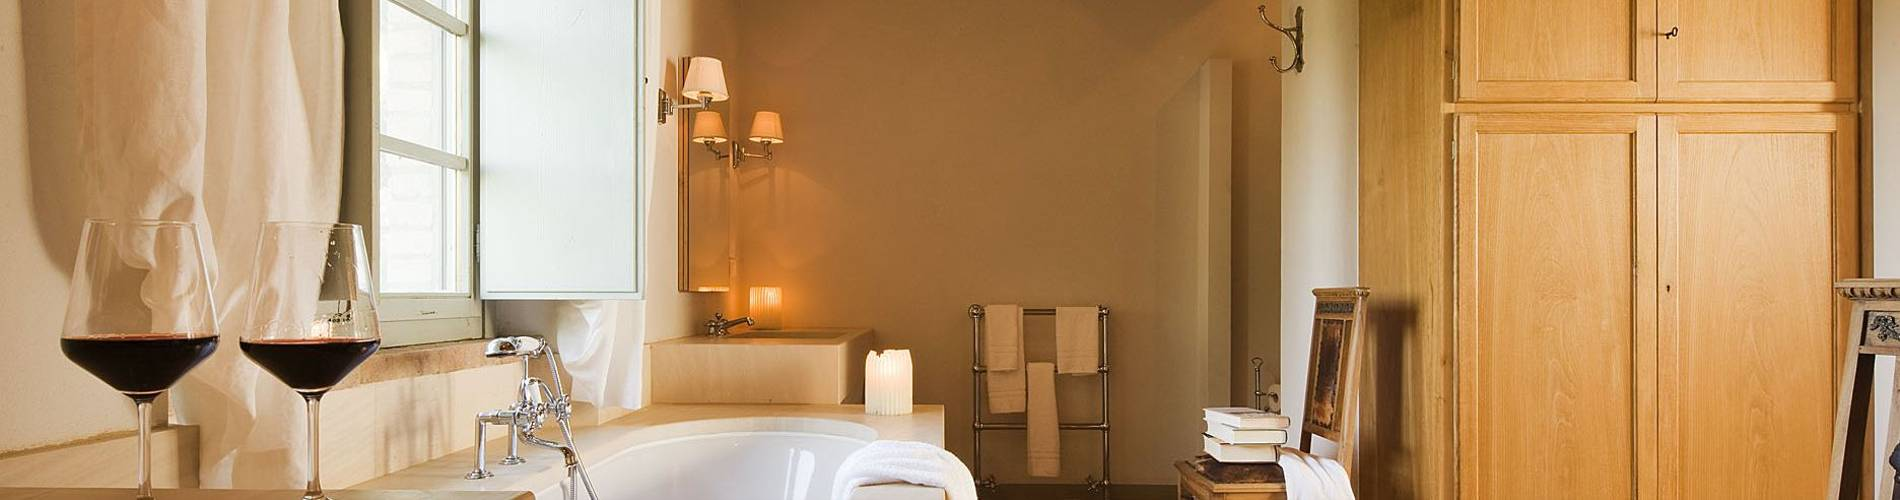 Conti Di San Bonifacio, Tuscany, Italy, Master Suite (10).jpg